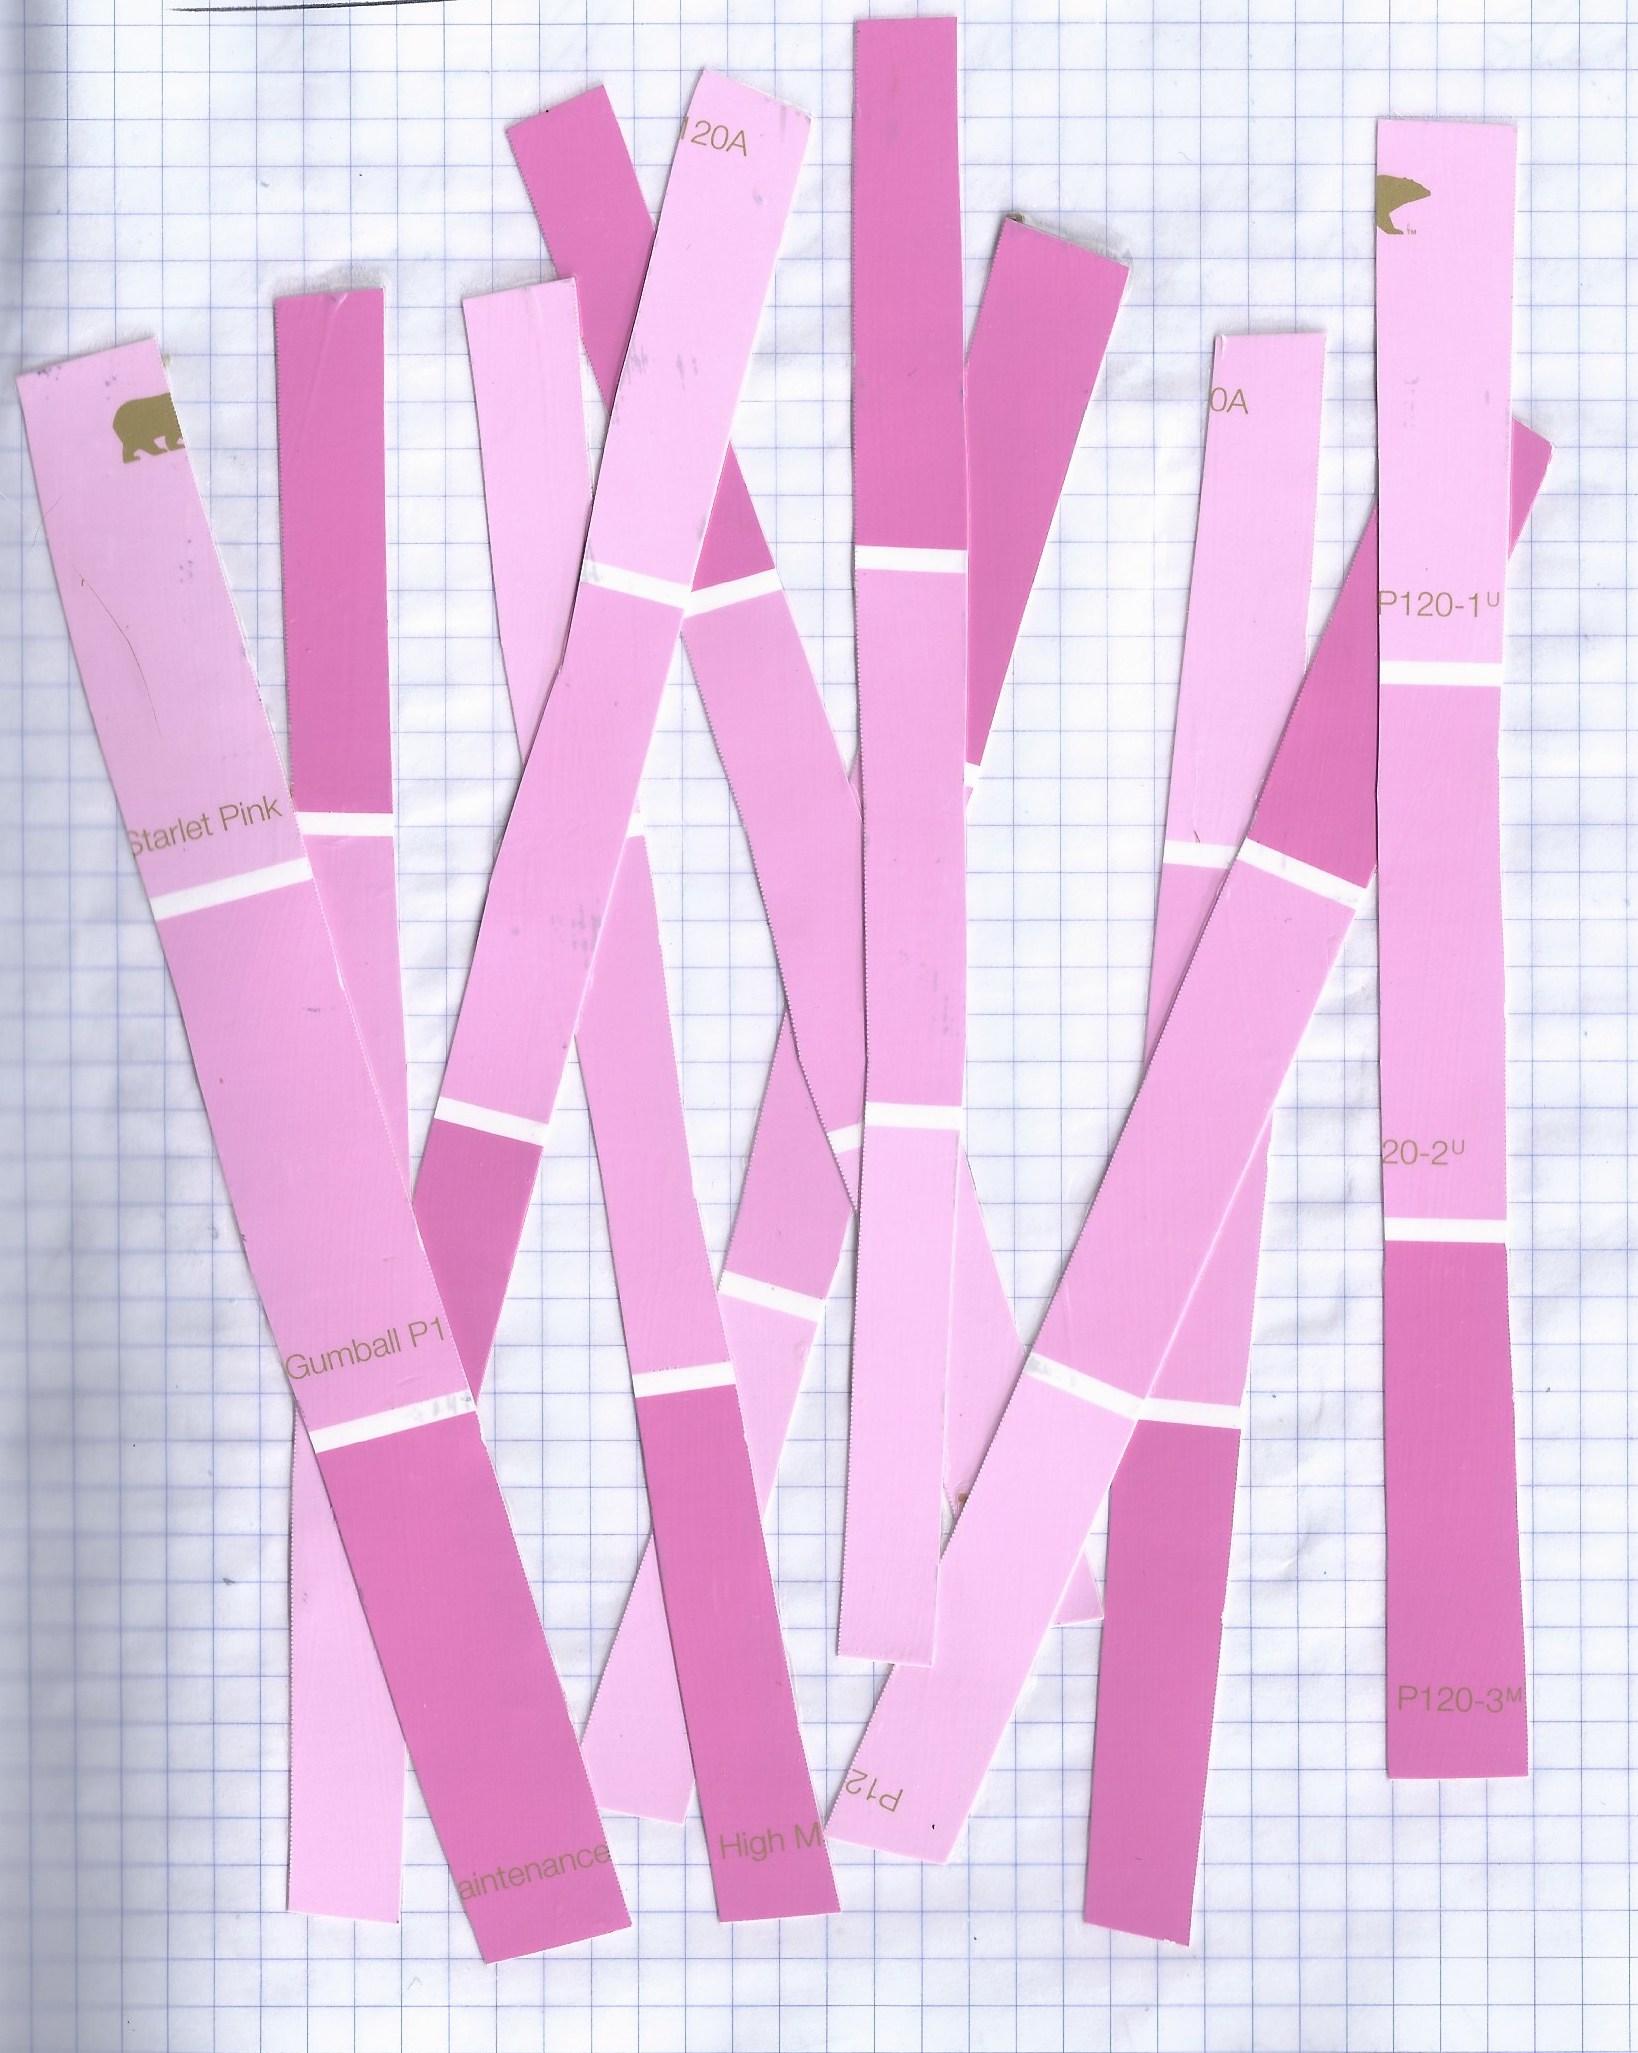 day 8 - pink sticks